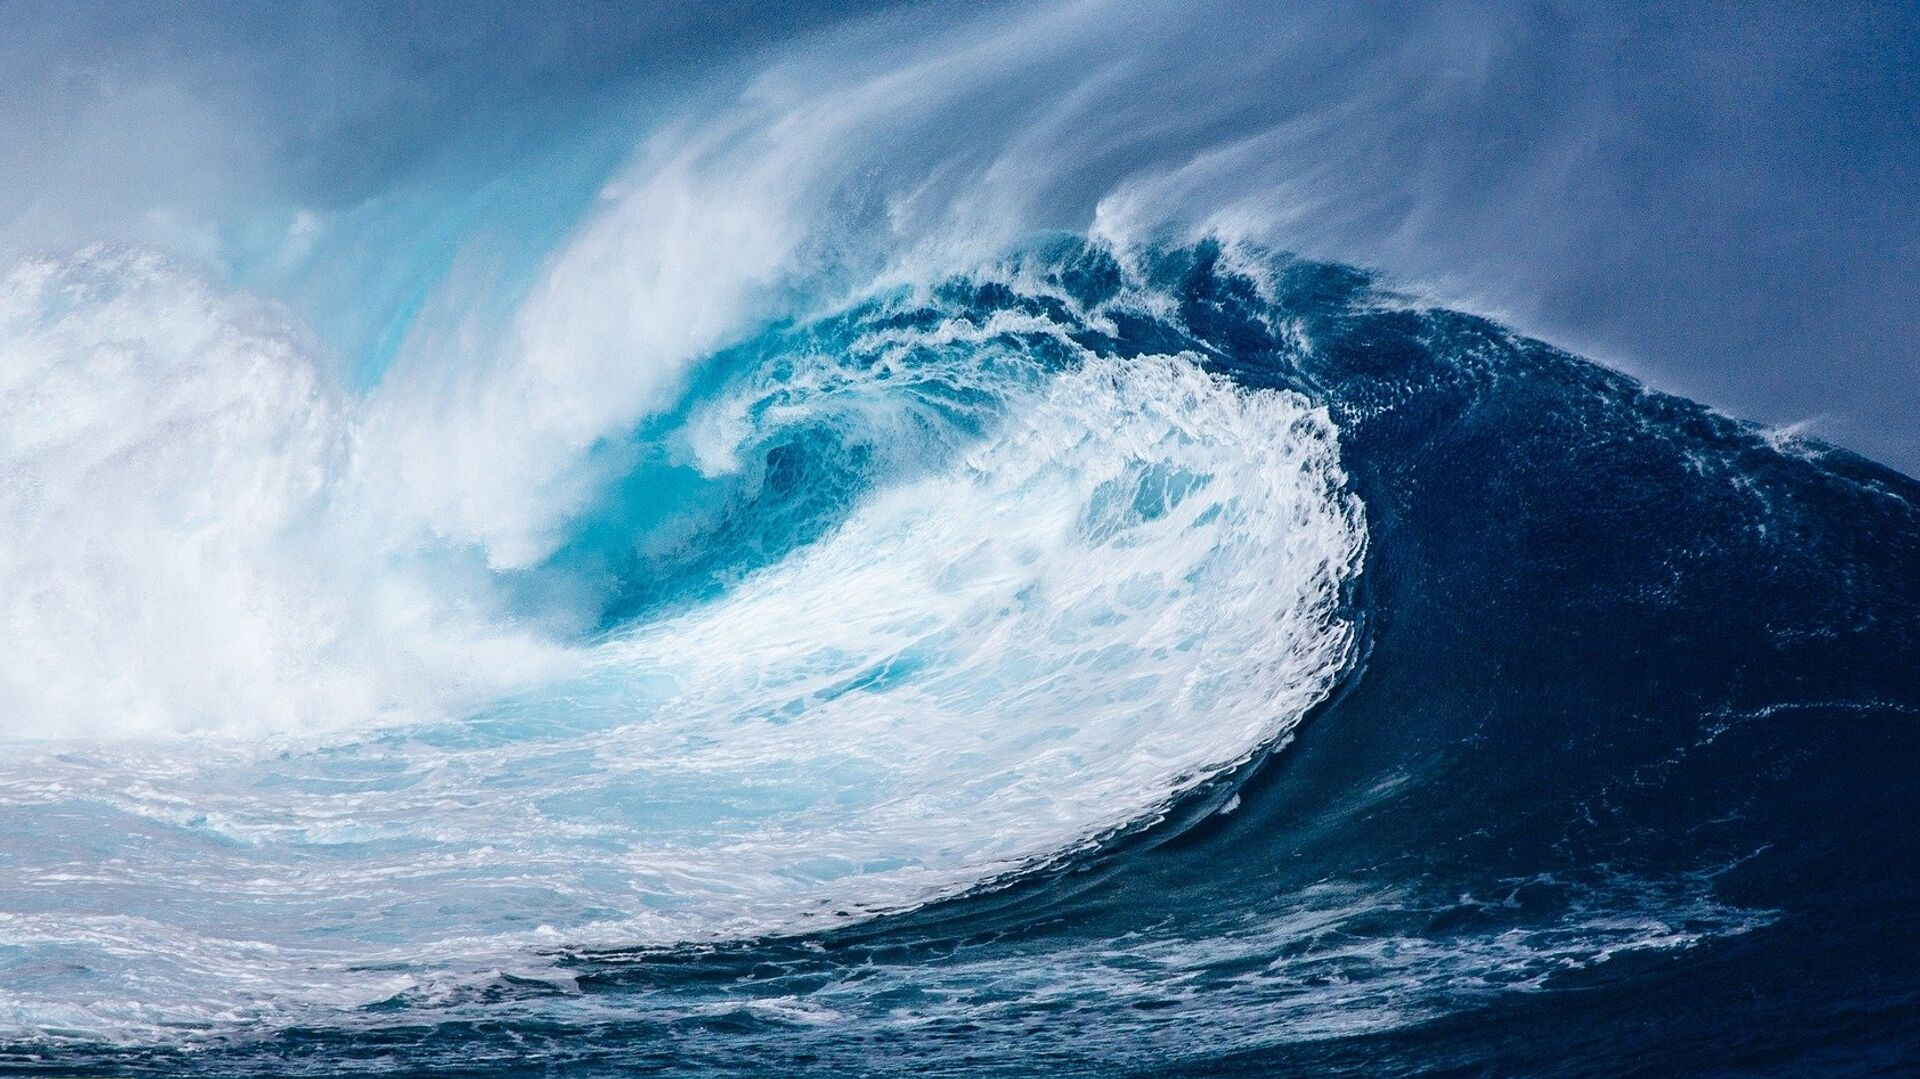 Волна в Атлантическом океане - РИА Новости, 1920, 01.11.2020